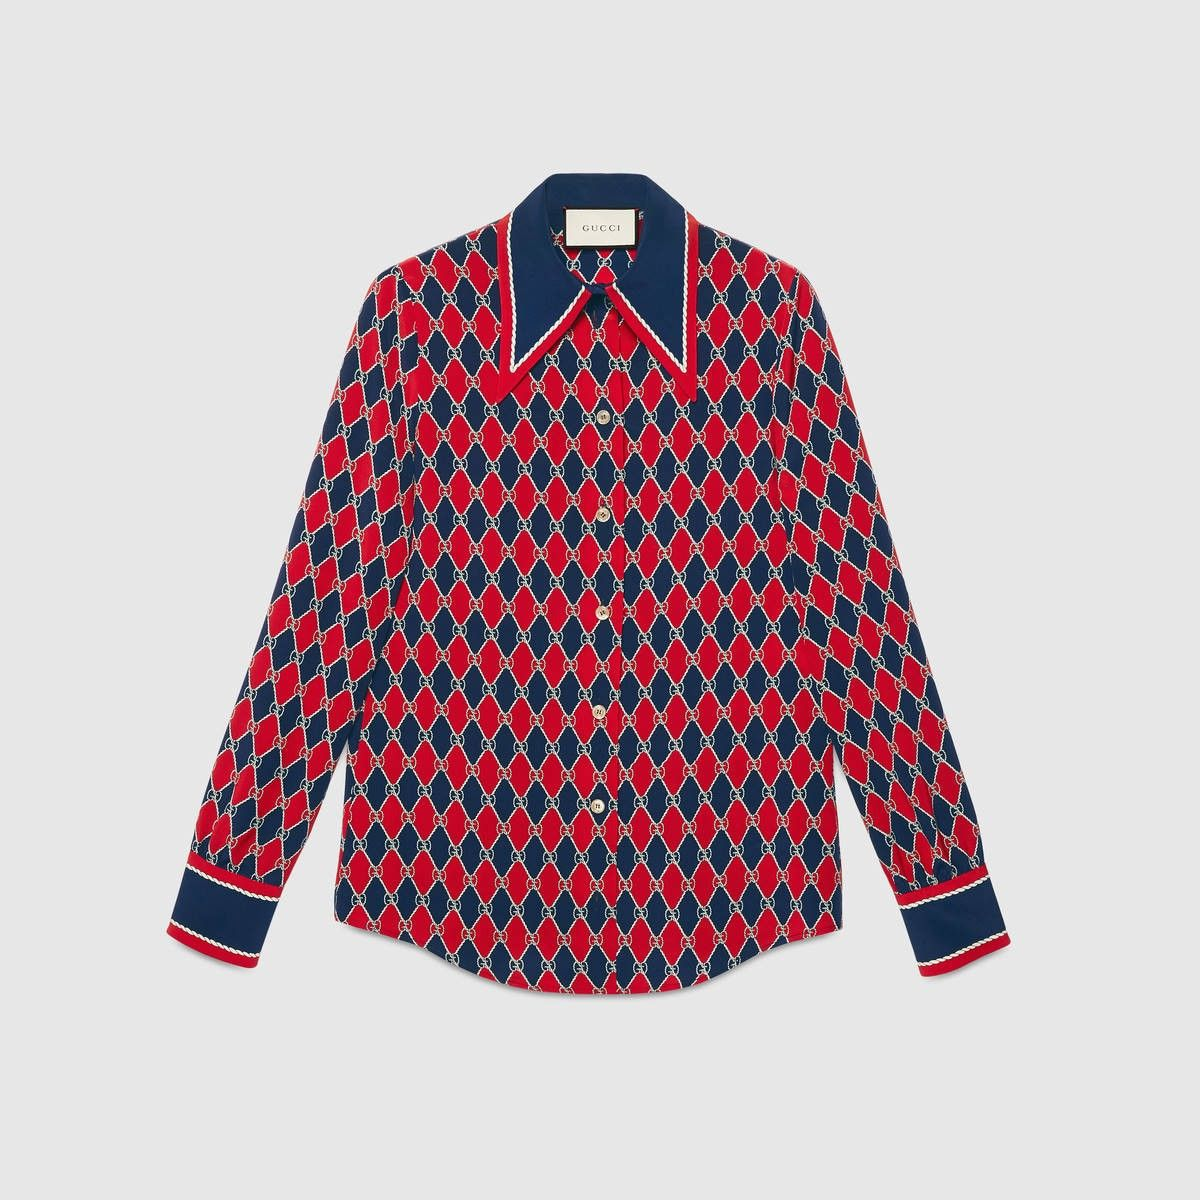 4a5540d5b26 GUCCI Gucci Rhombus print silk shirt - Gucci Rhombus silk.  gucci  cloth